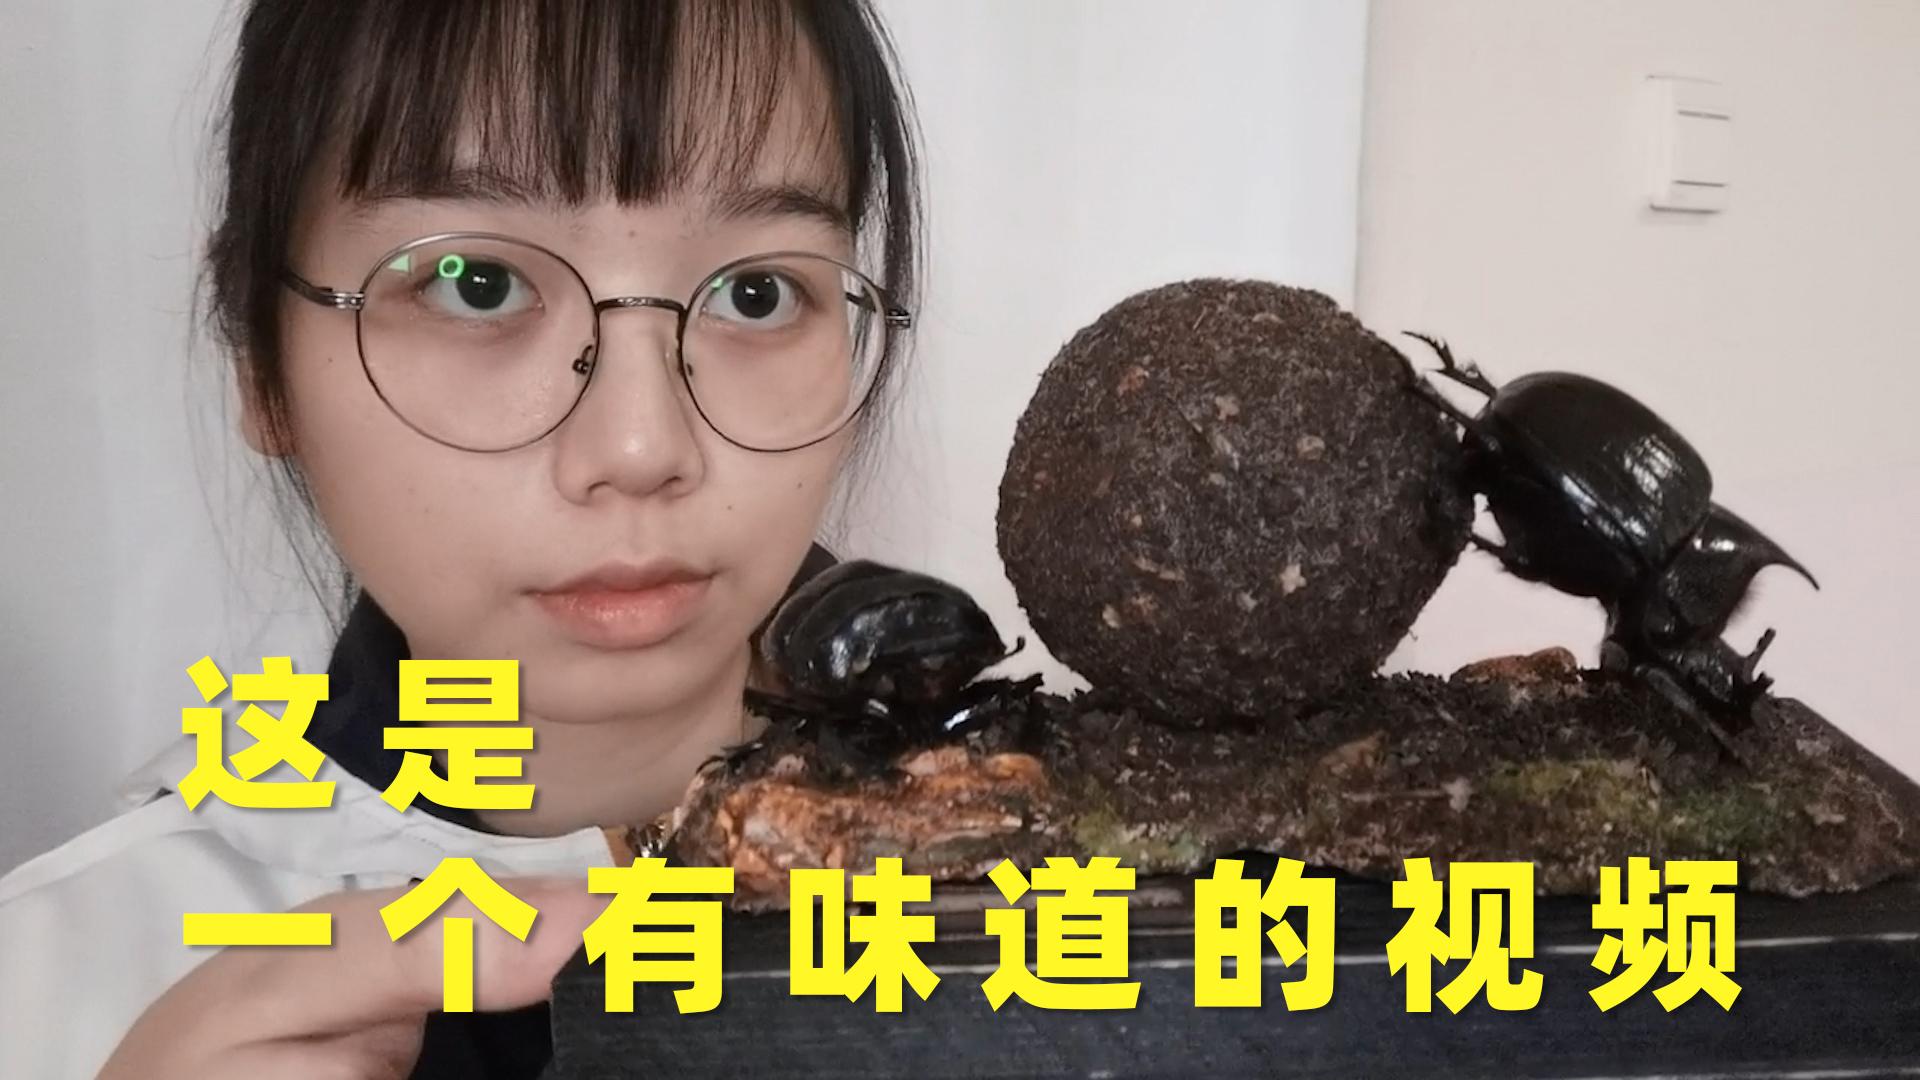 【A等生】【全民】制作世界上最大的屎壳郎的标本,所以这个球是……?